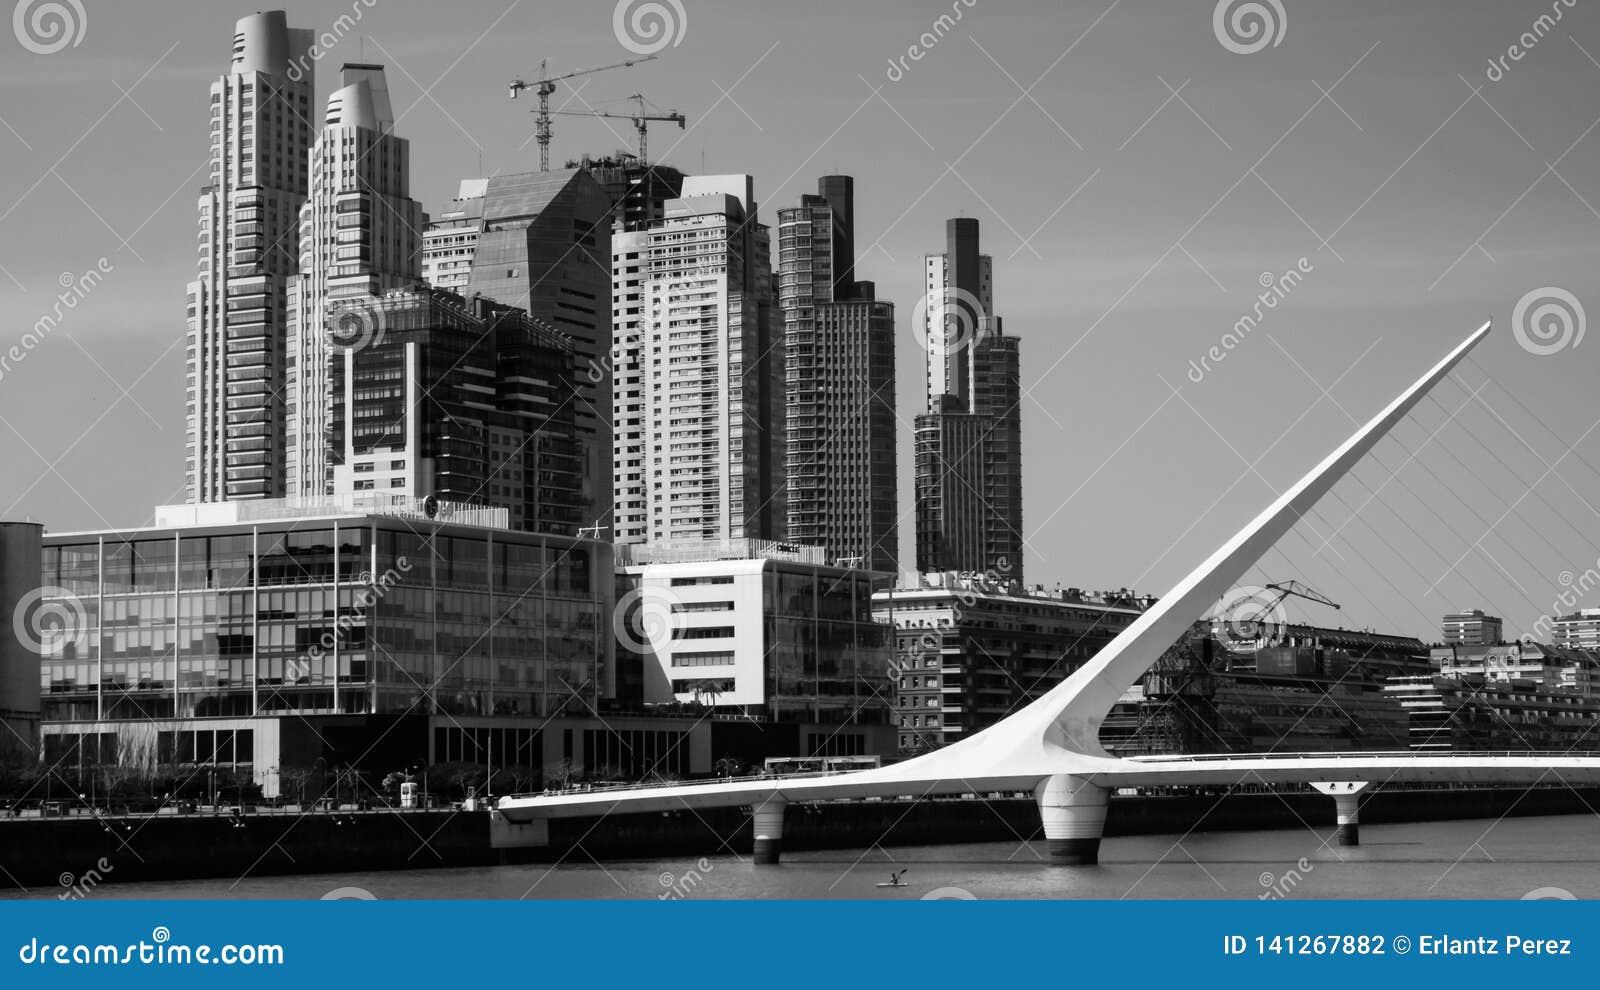 Woman Bridge of Calatraba in Buenos Aires,Puerto Madero, white and Black